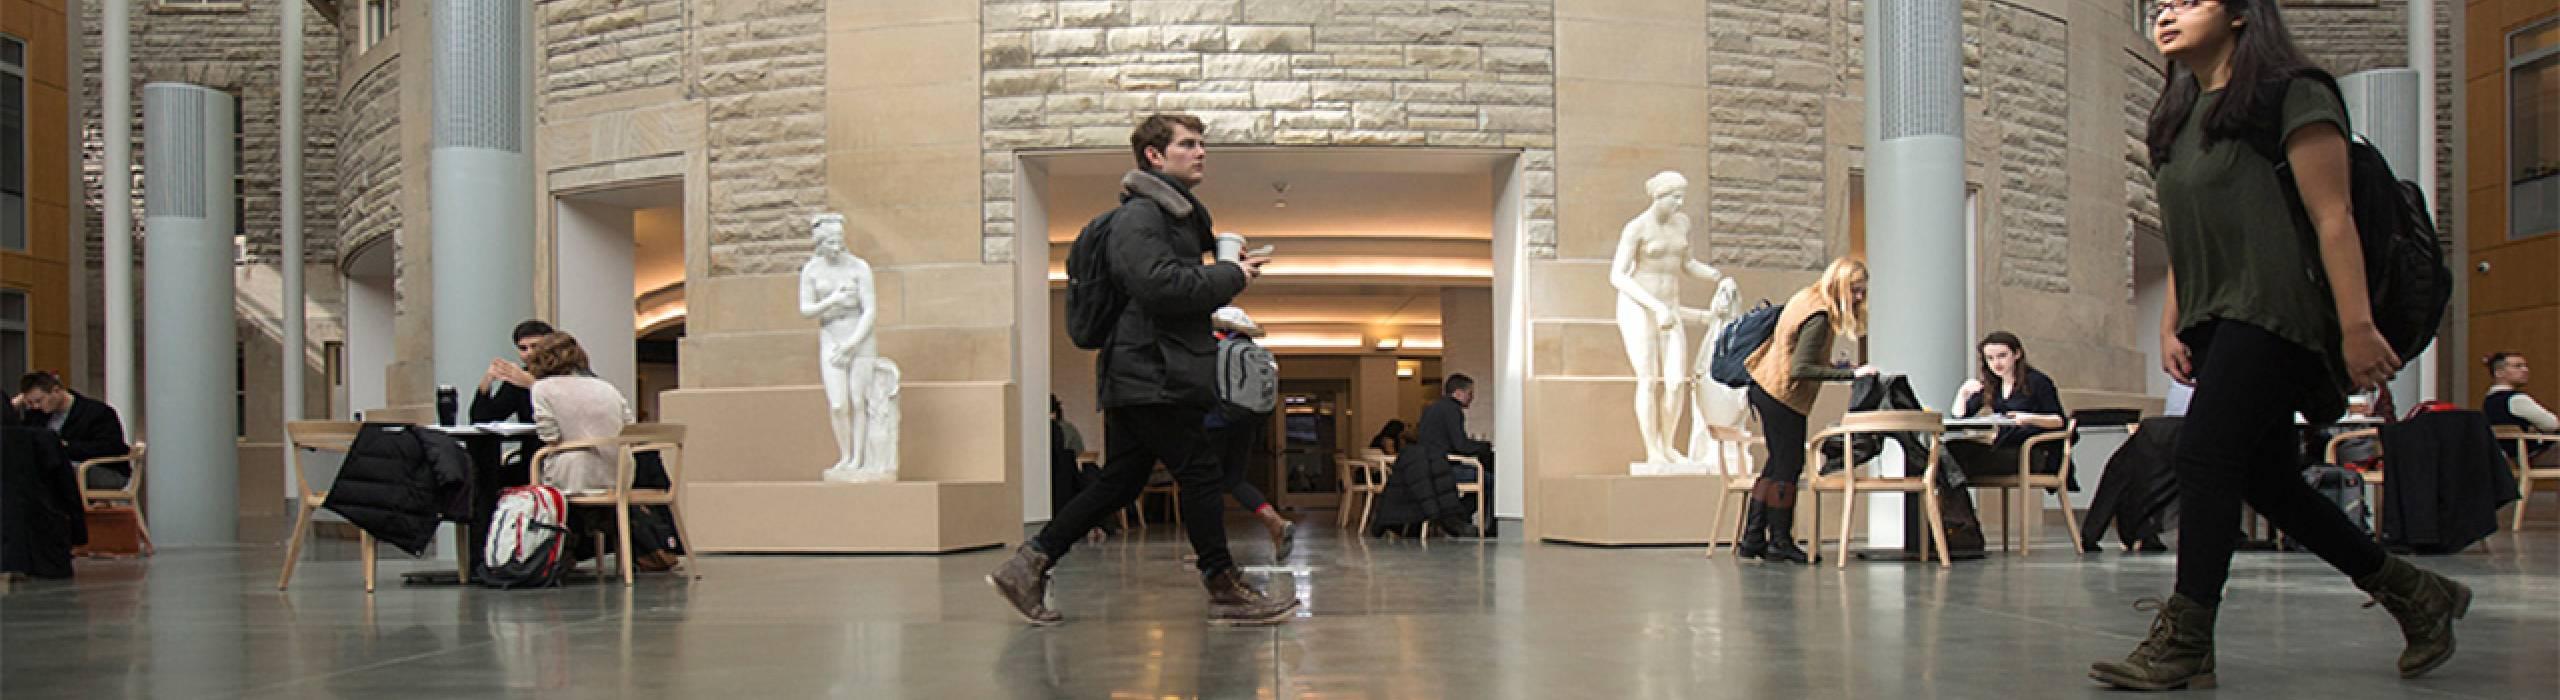 Arts and Sciences (CAS) students walk through the Klarman Hall atrium.